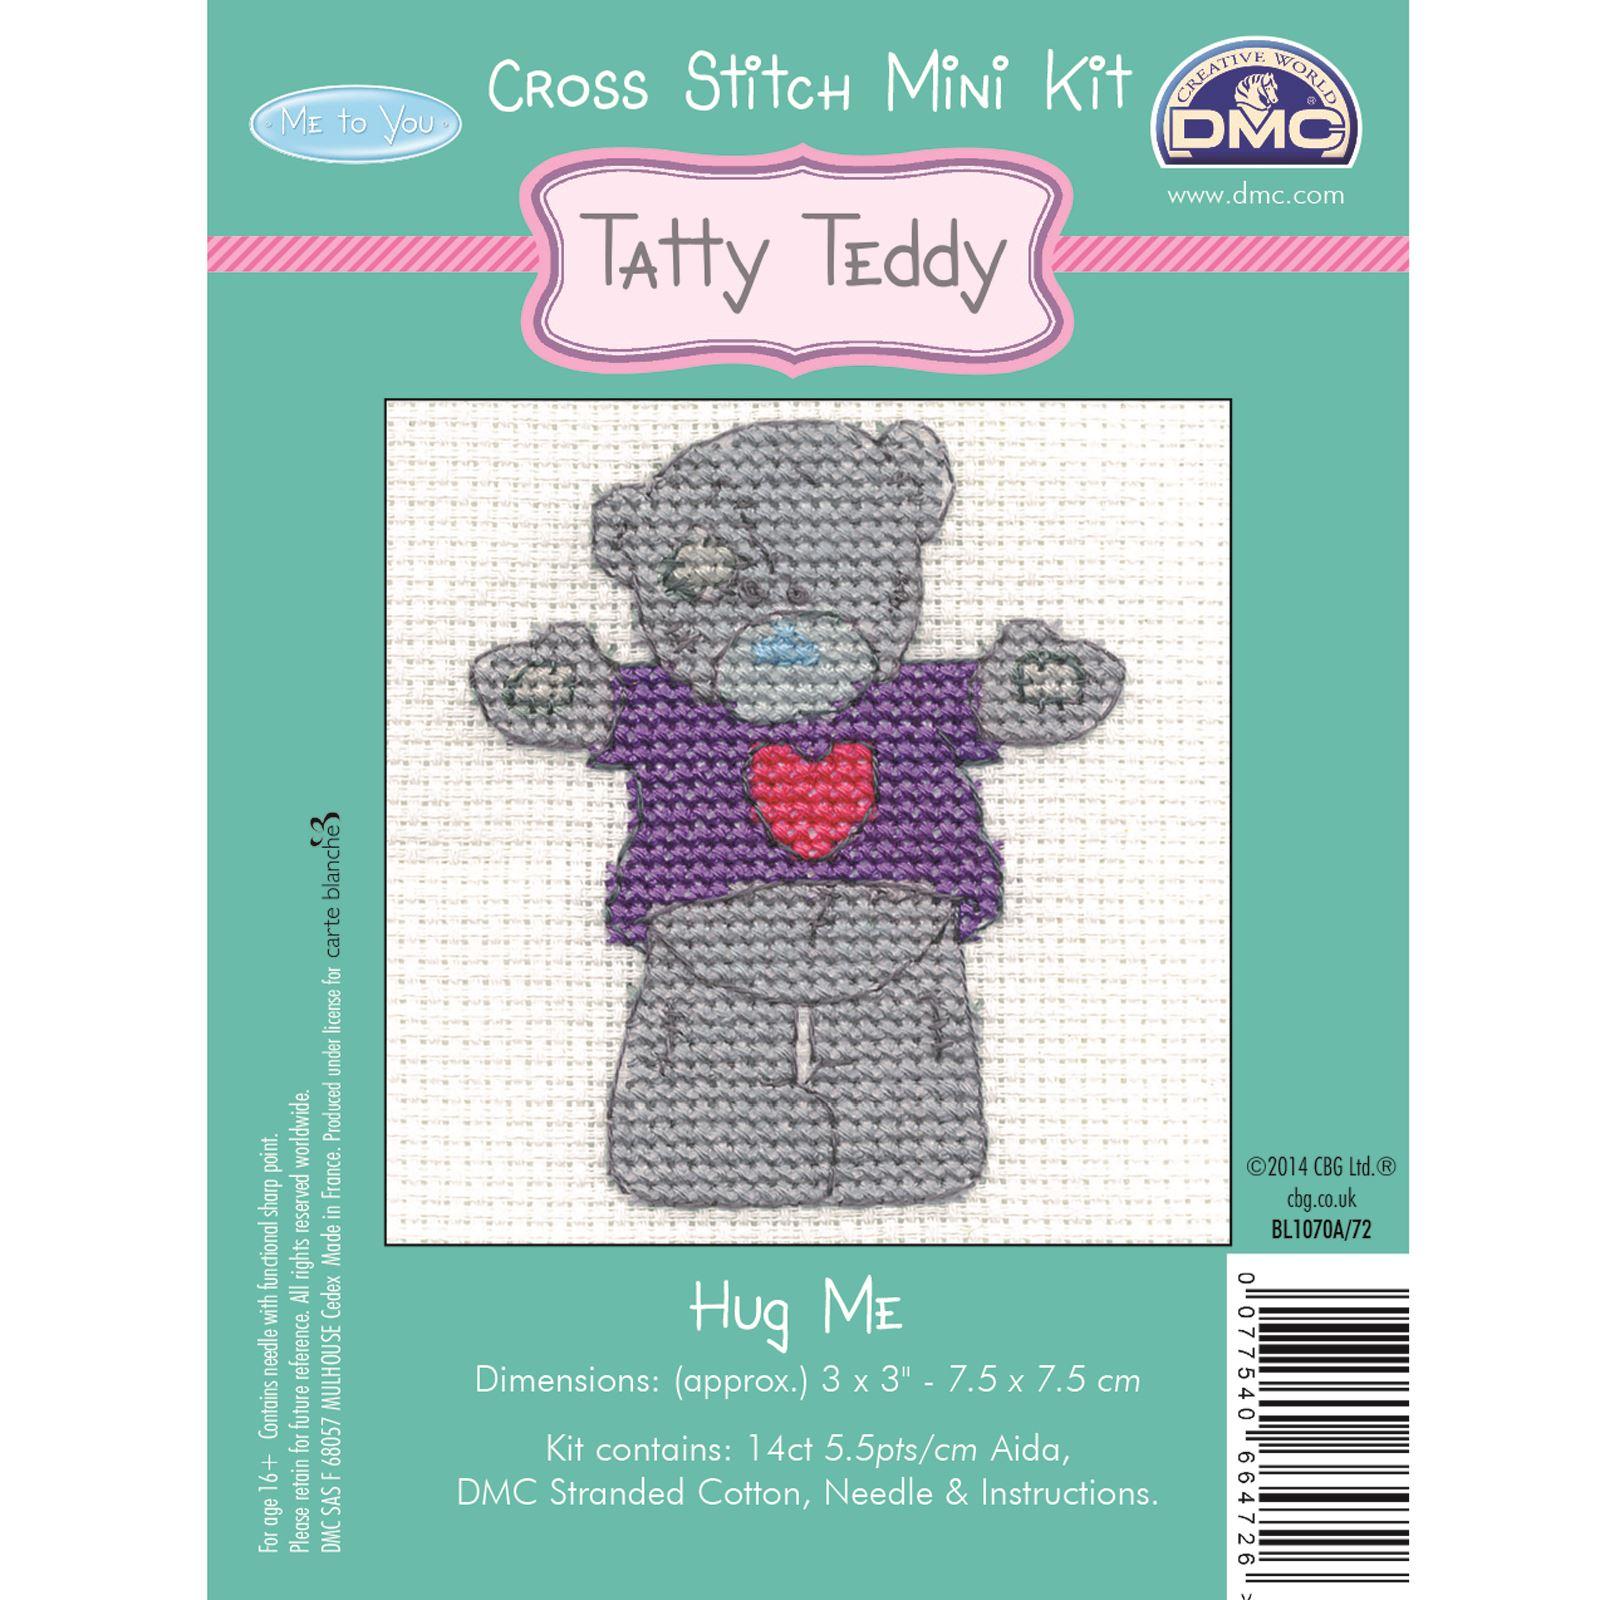 DMC-Mini-Cross-Stitch-Kit-Me-to-You-Tatty-Teddy-8-Designs thumbnail 7